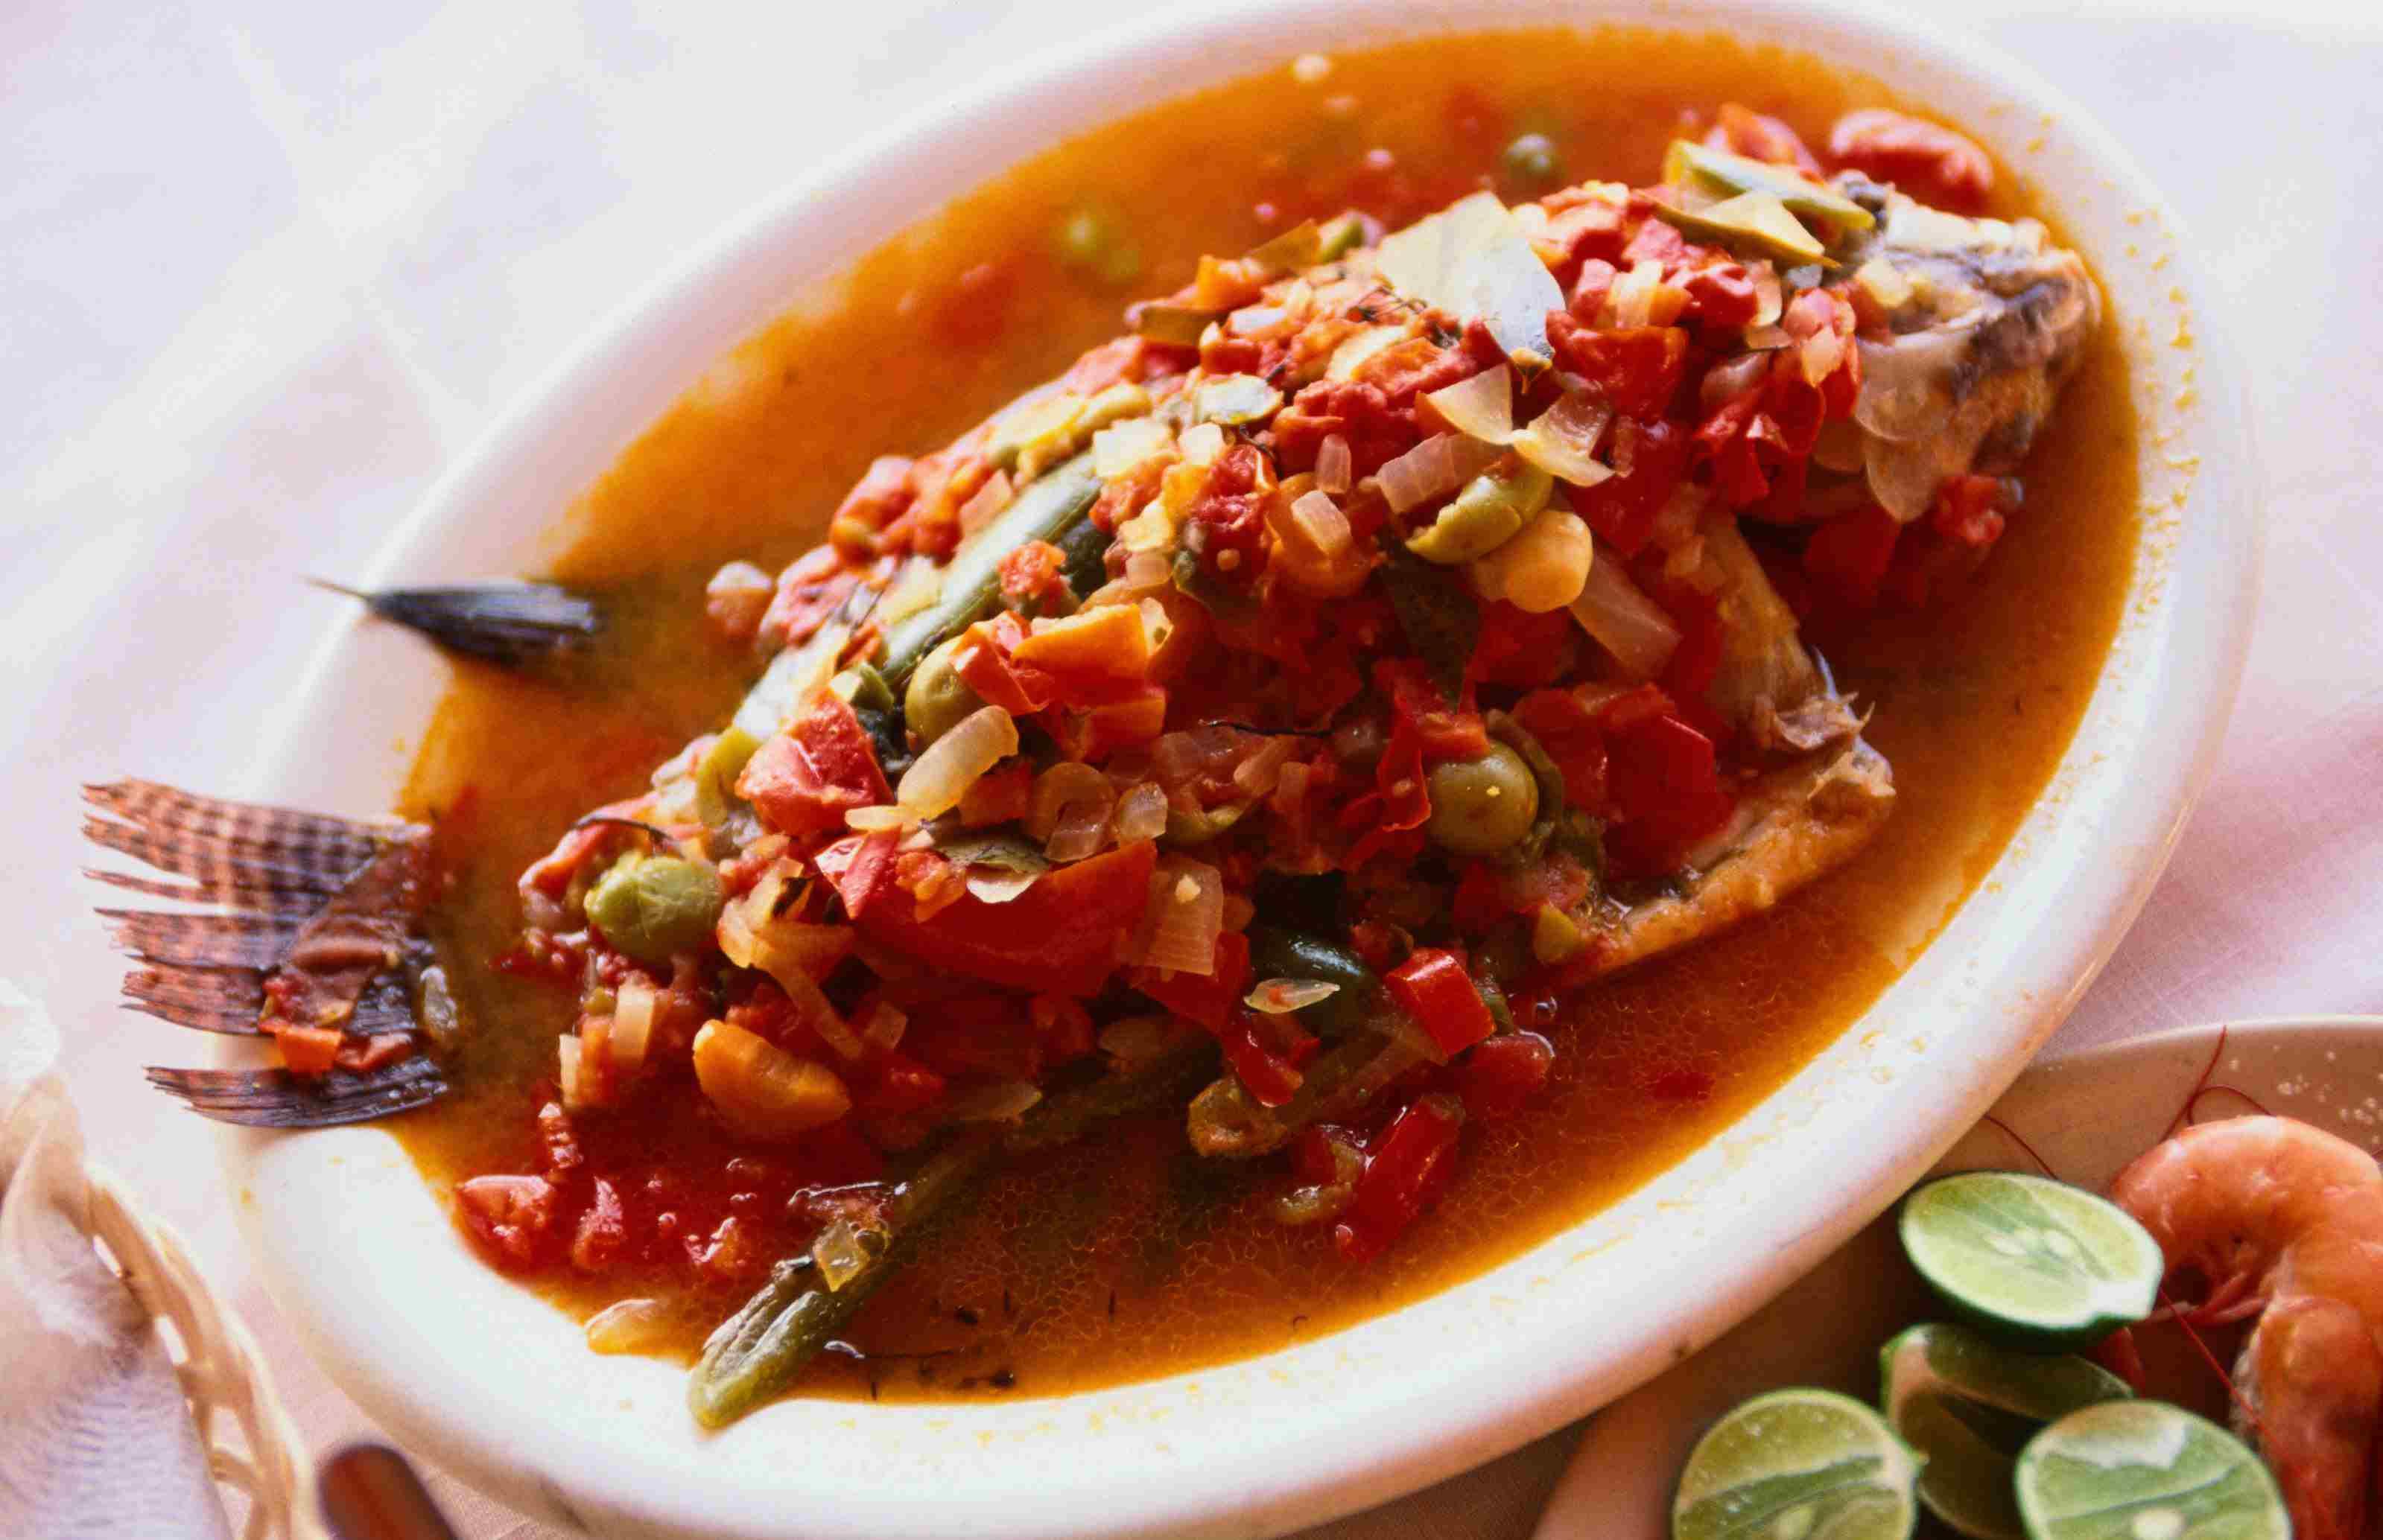 Traditional food of Veracruz: Spicy baked fish - Veracruz